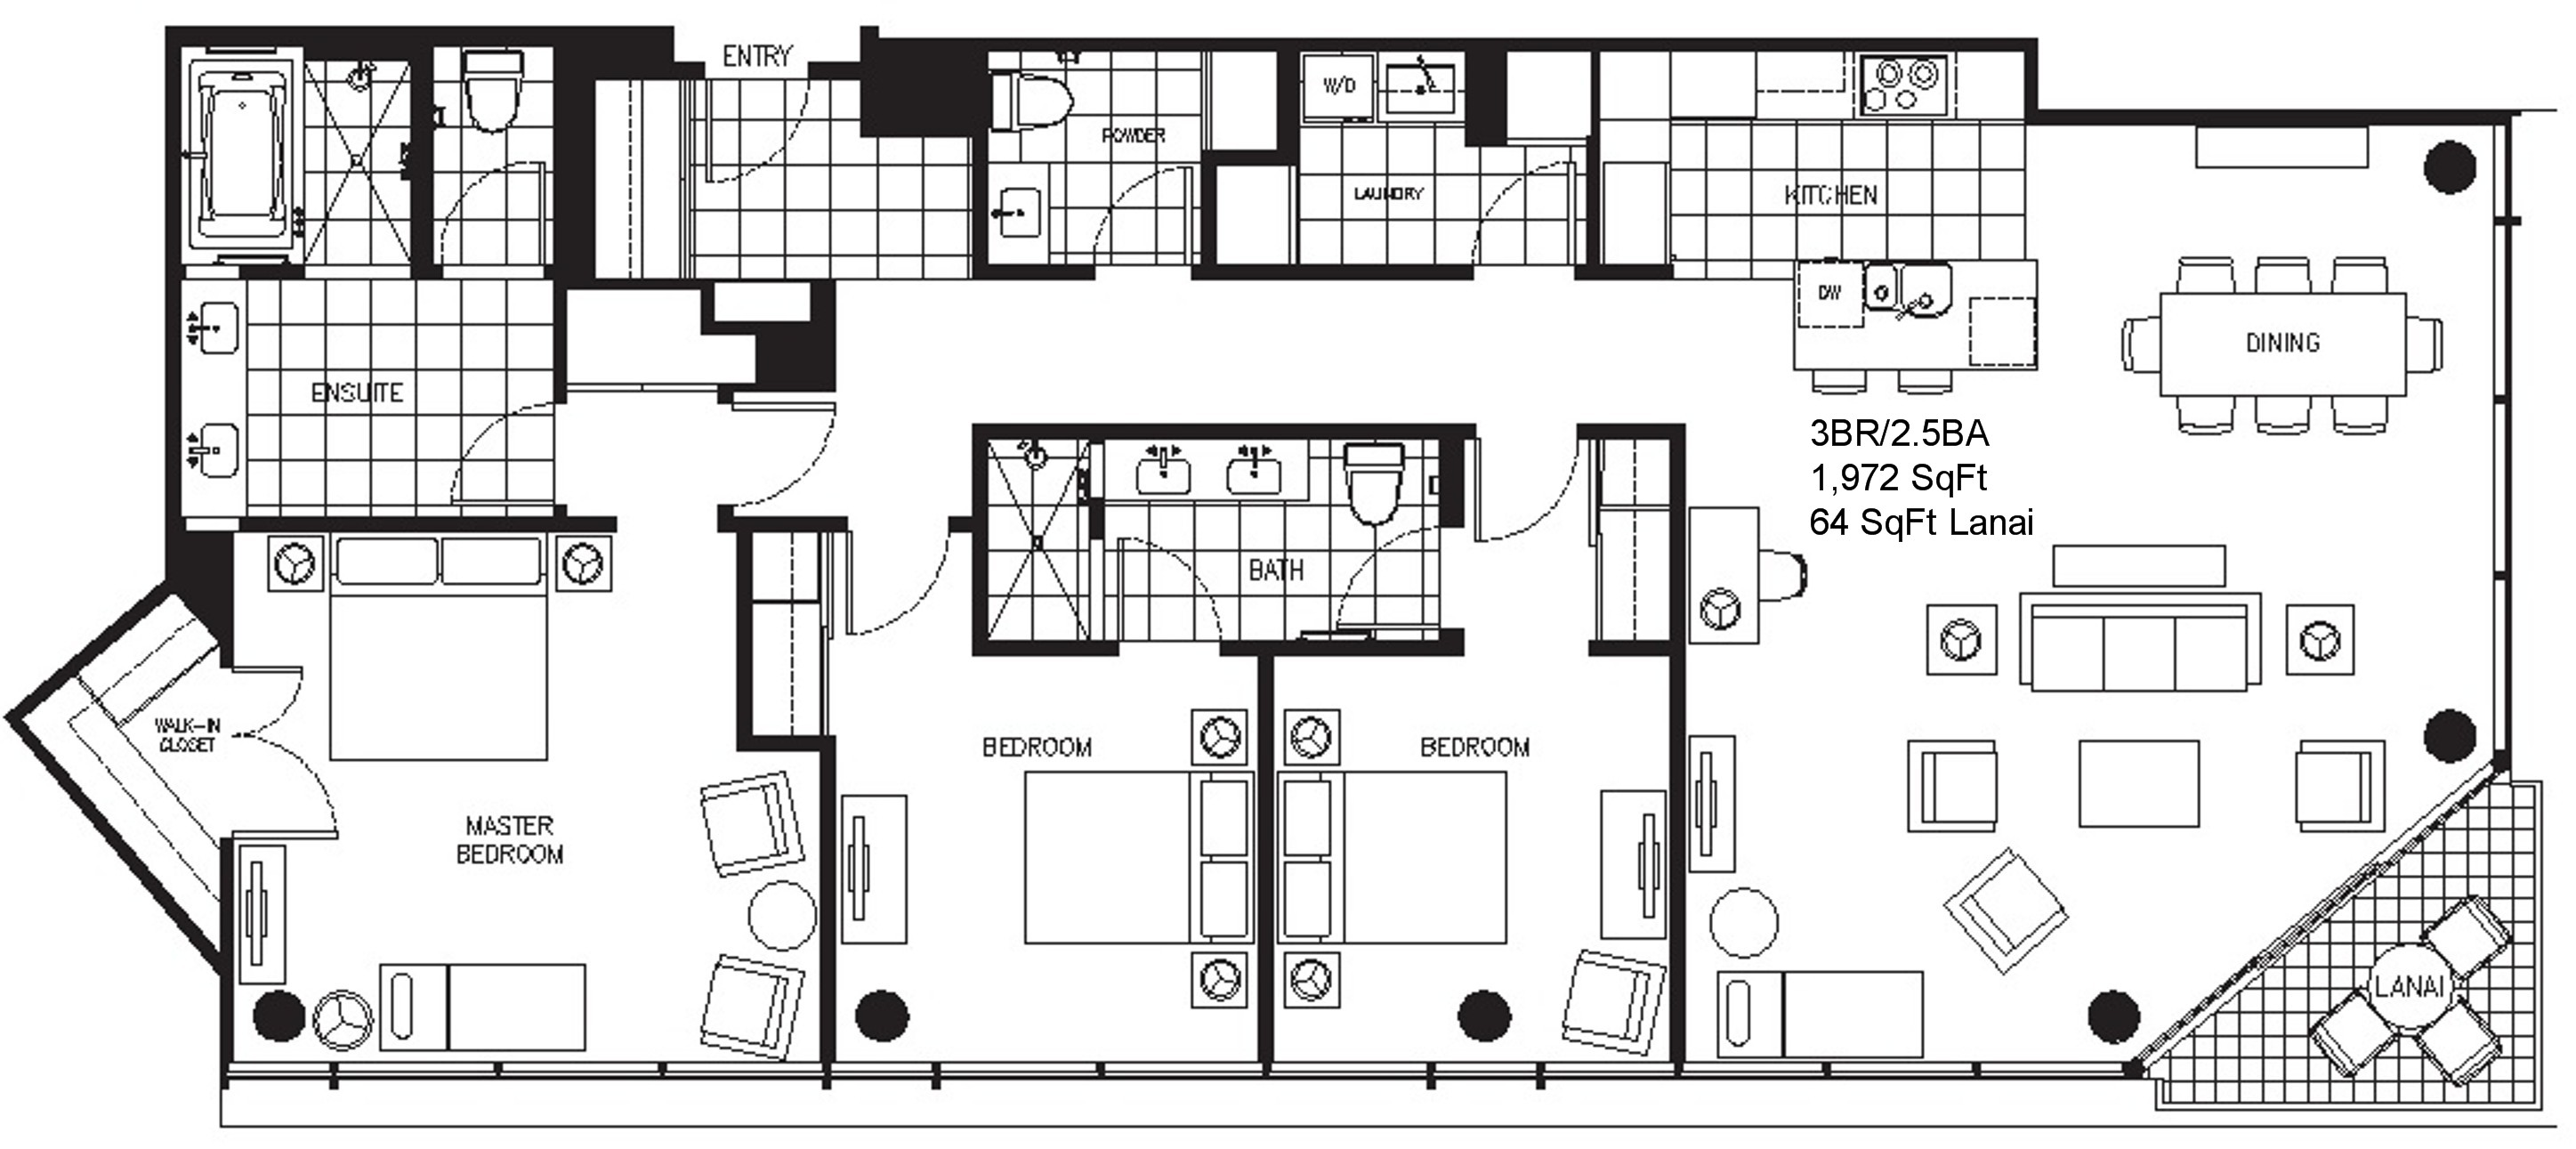 trump tower waikiki floor plans